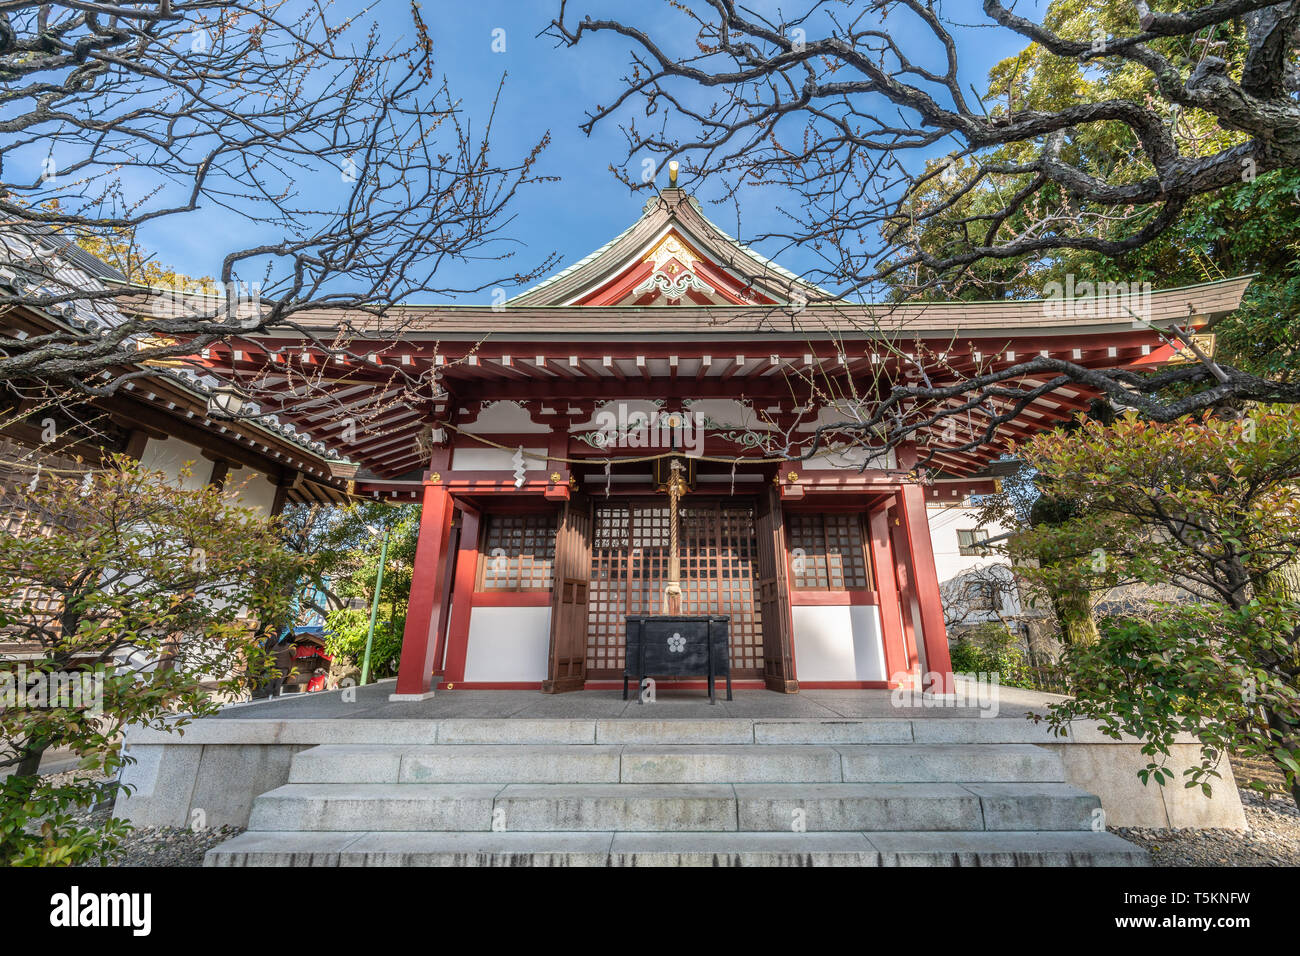 Tokyo, Japan - March 18, 2019 : Mitake Jinja built in 1669 in the precincts of   Kameido Tenjin Shinto Shrine. Devoted to U-no-Kami or Unokami Deity - Stock Image